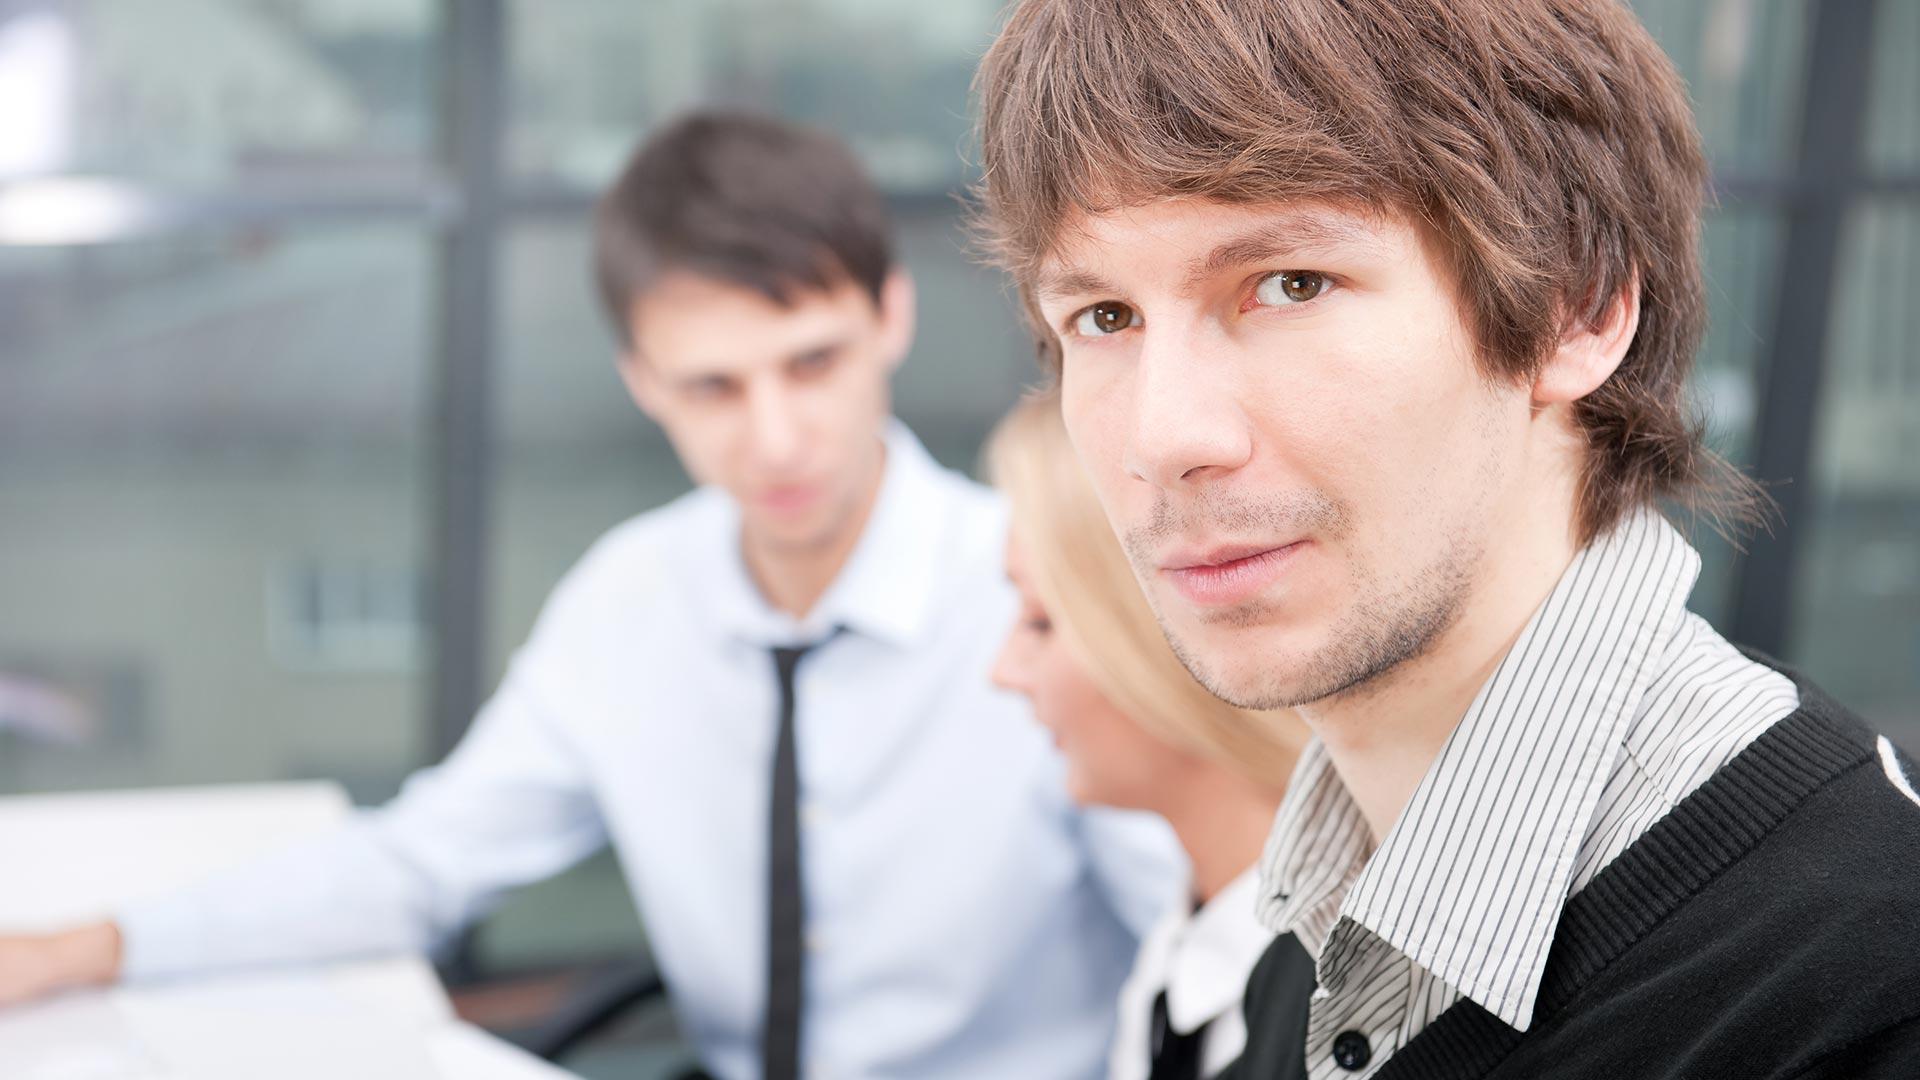 Lehrstelle als kauffrau kaufmann profil e wanner for Lehrstelle als innendekorateurin